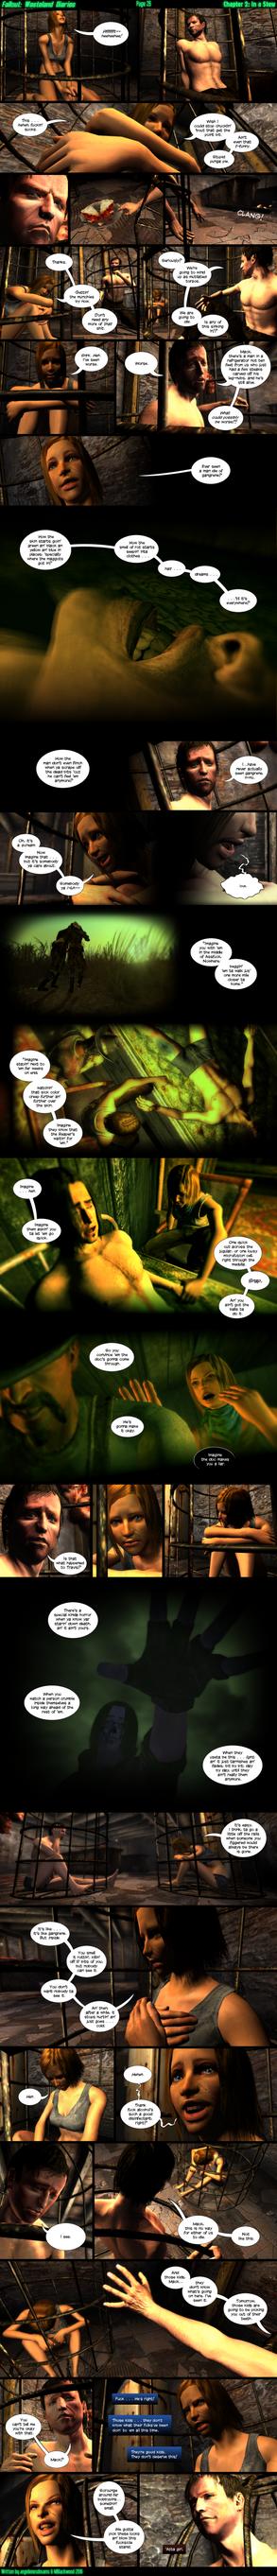 Wasteland Diaries - Page 26